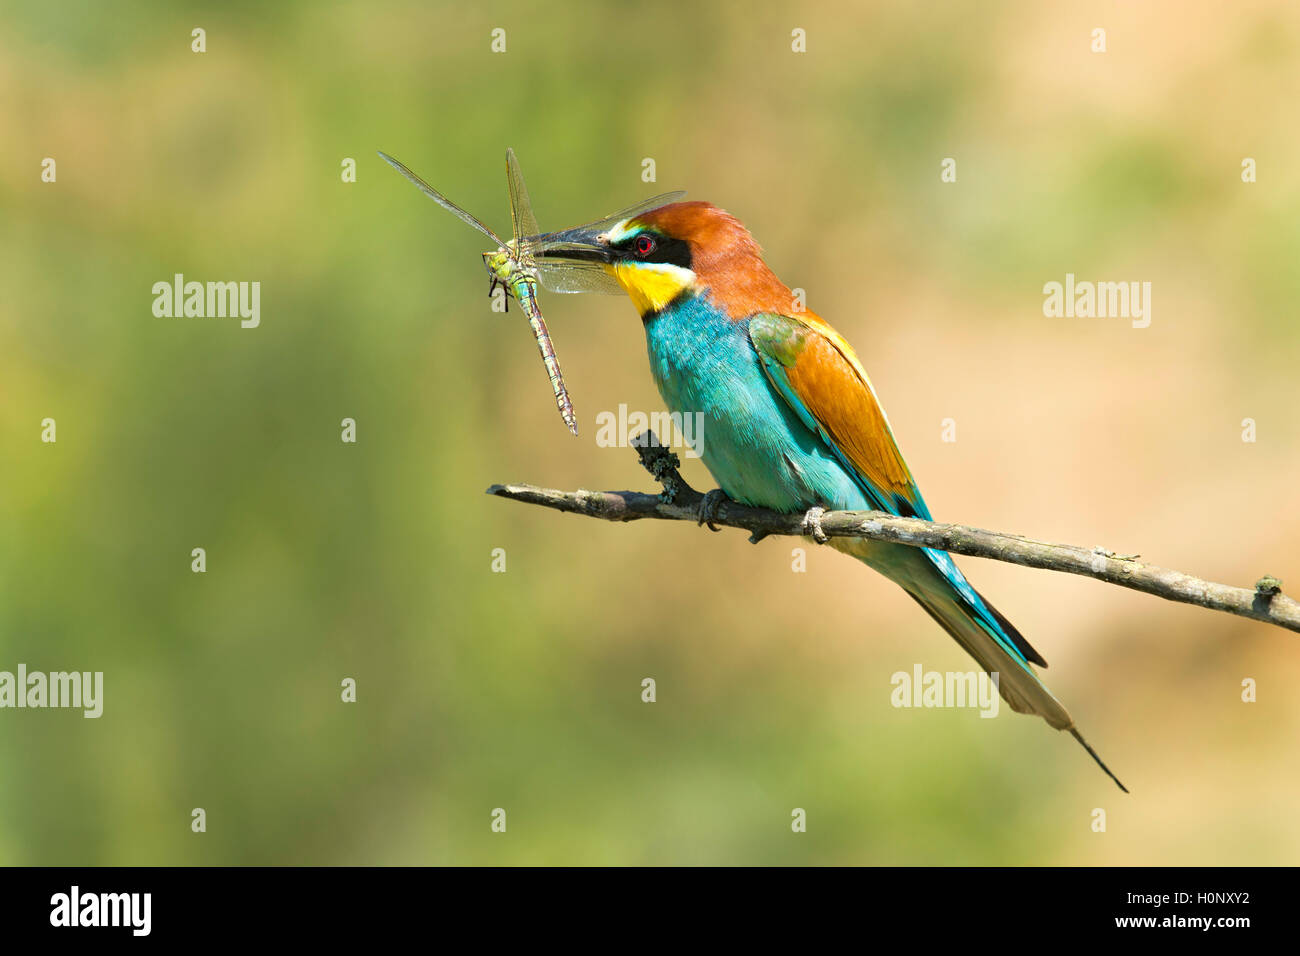 European bee-eater (Merops apiaster) with dragonfly, prey, Burgenland, Austria Stock Photo